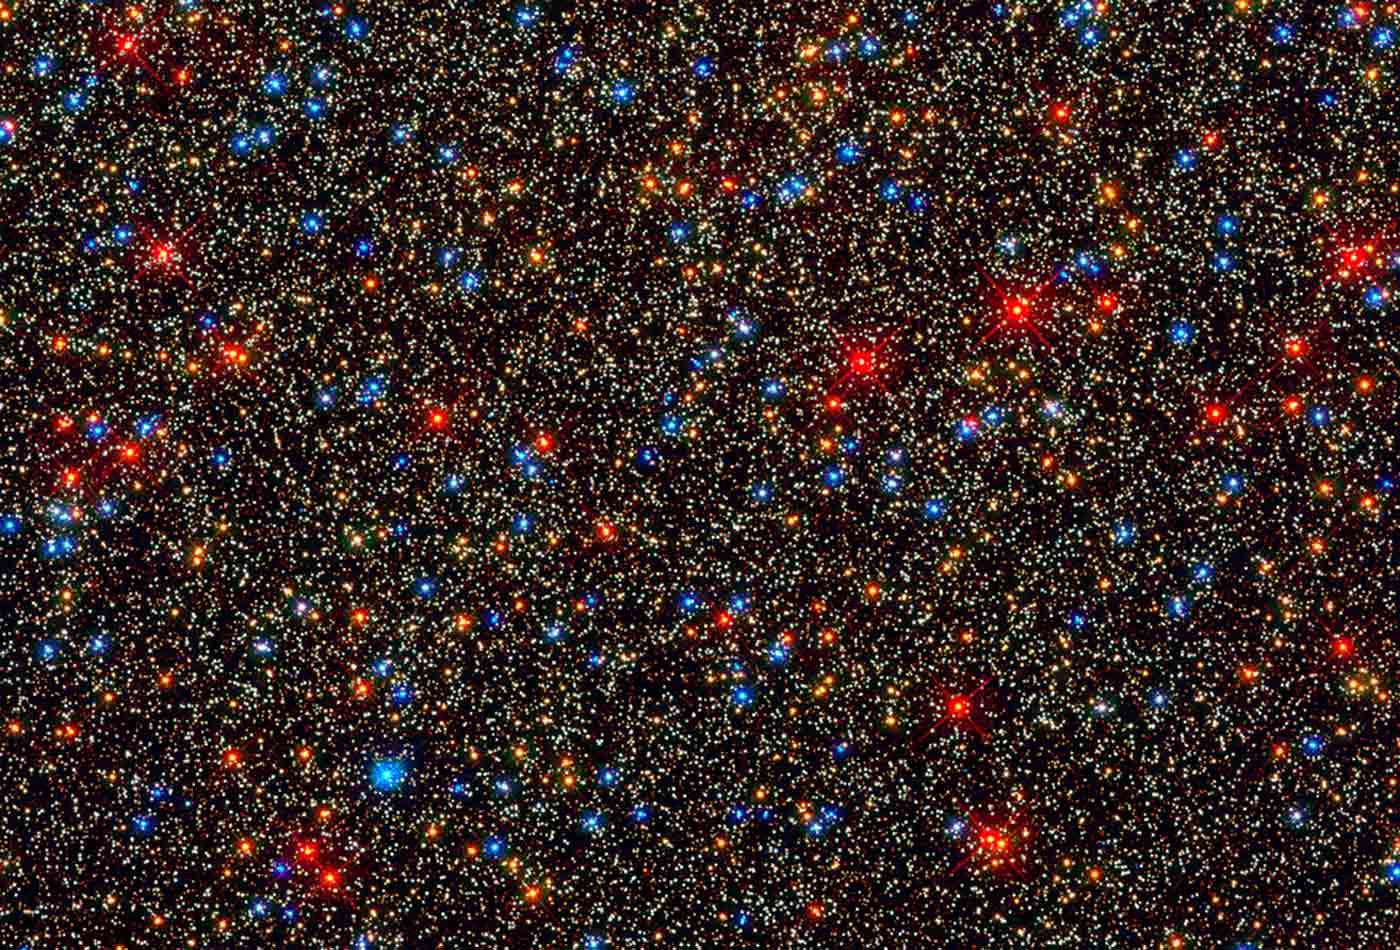 A small region inside the massive globular cluster Omega Centauri.